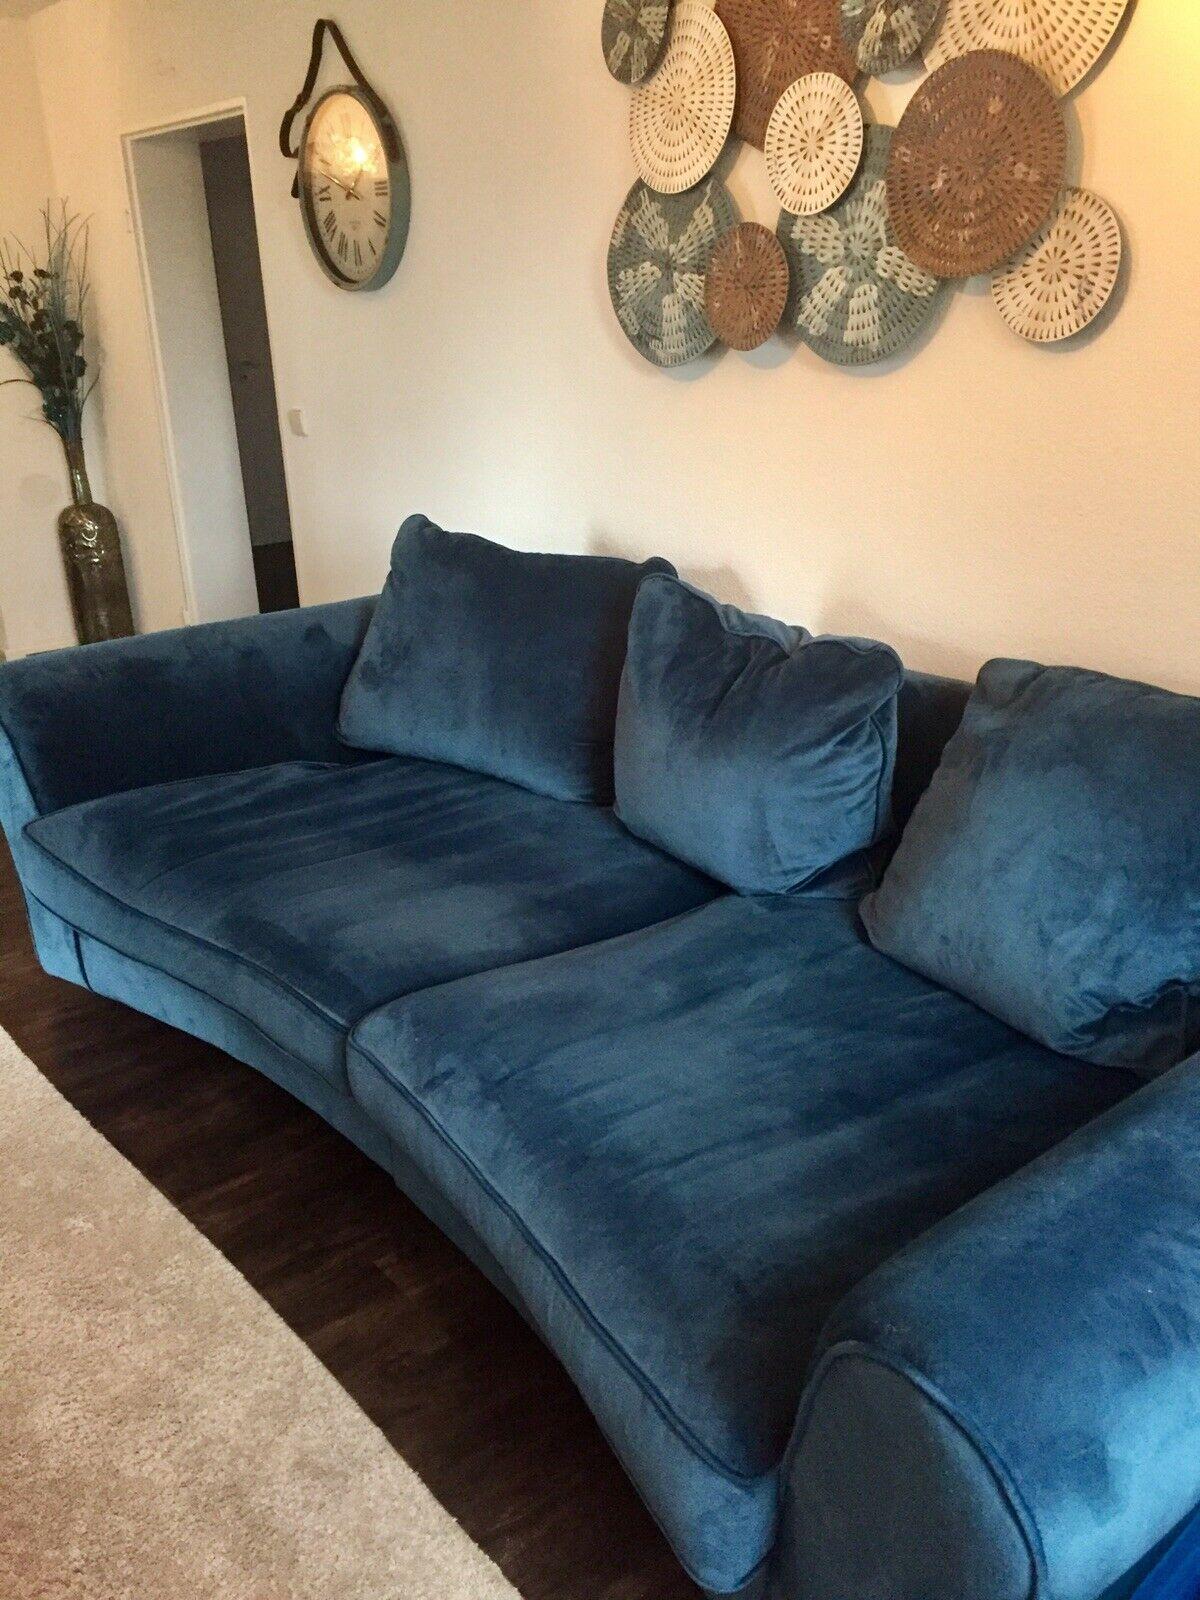 Big Sofa Couch Petrol Blau Samt Sitzgarnitur Ebay Sofa Sessel Sofa Couch Haus Deko